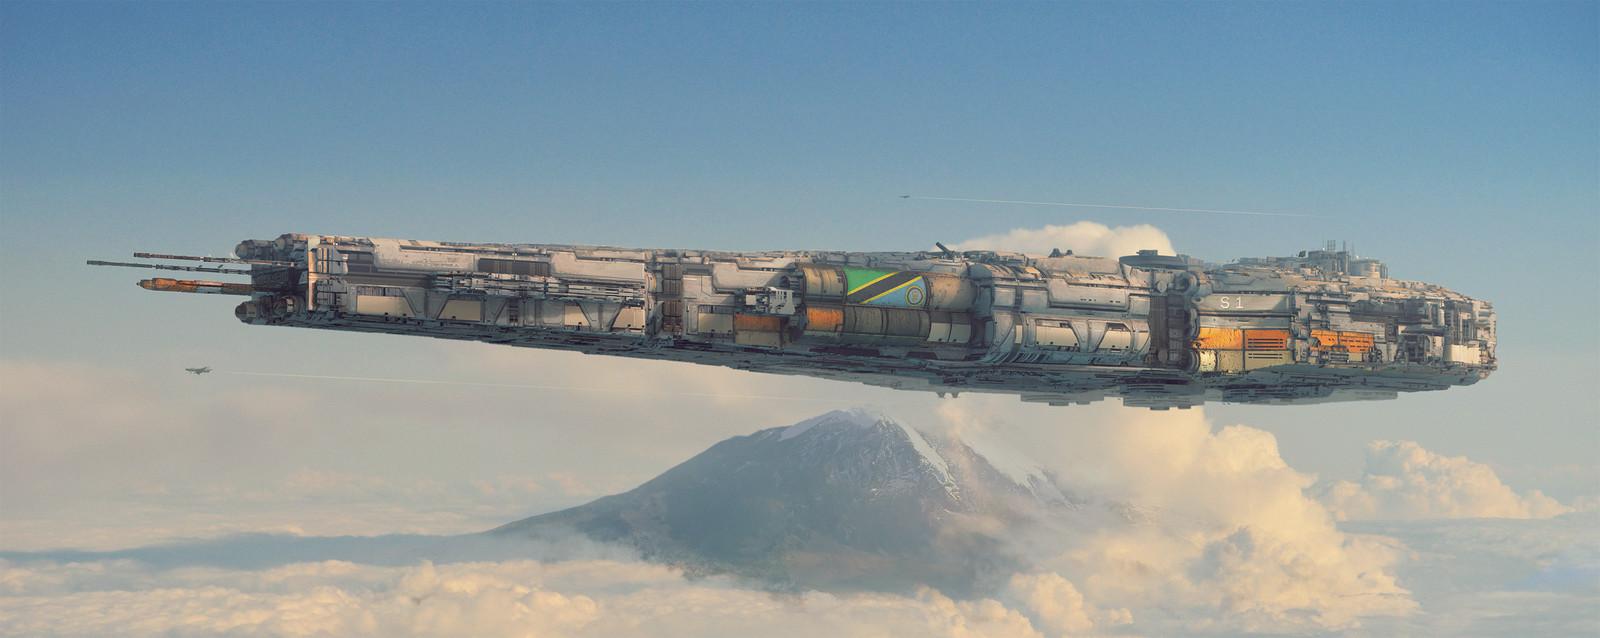 Aviation Series 3: The Serengeti-1 Battlecruiser